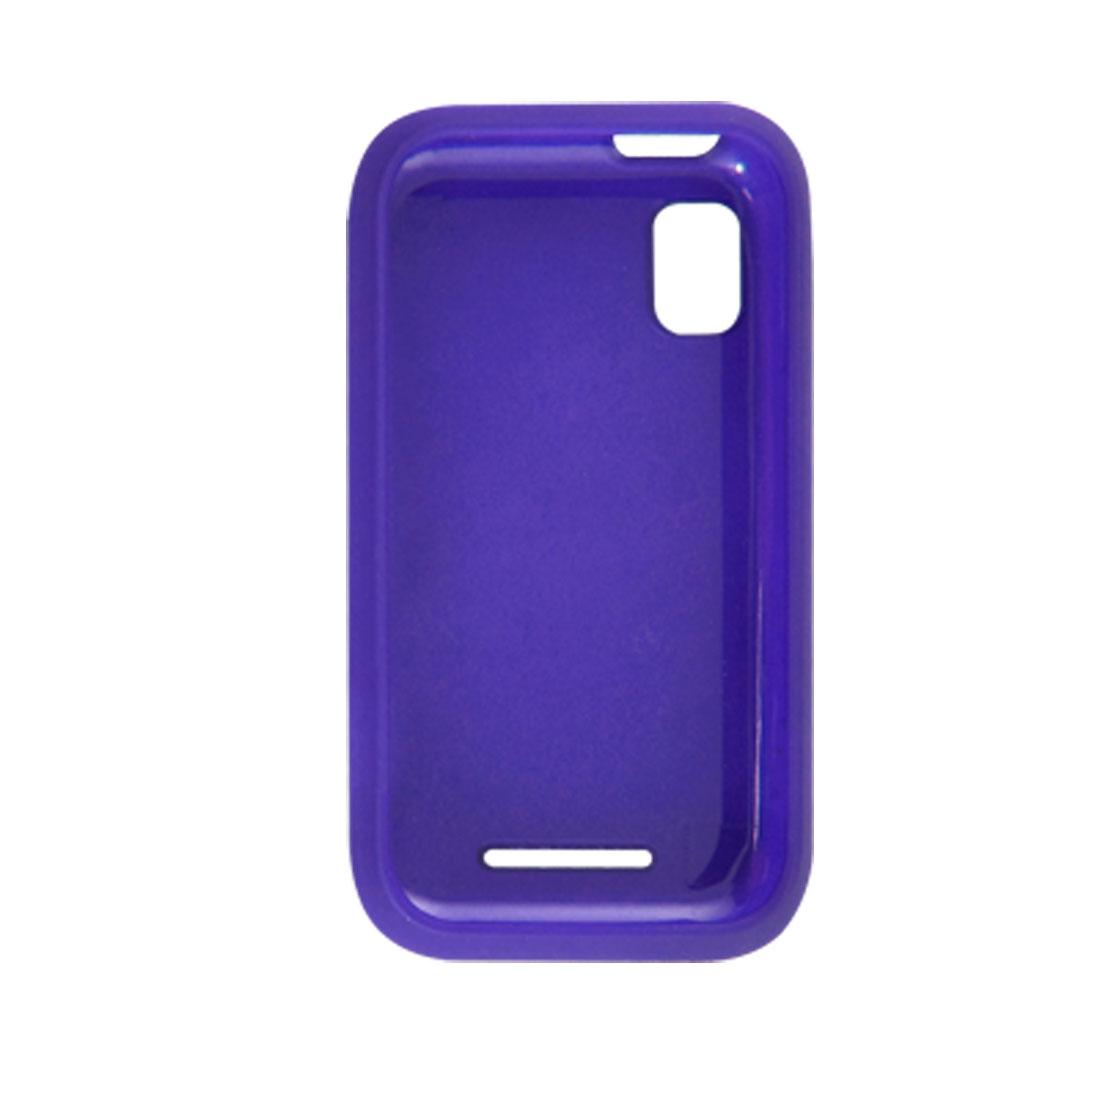 Blue Rubberized Plastic Detachable Case Shield for Motorola MB508